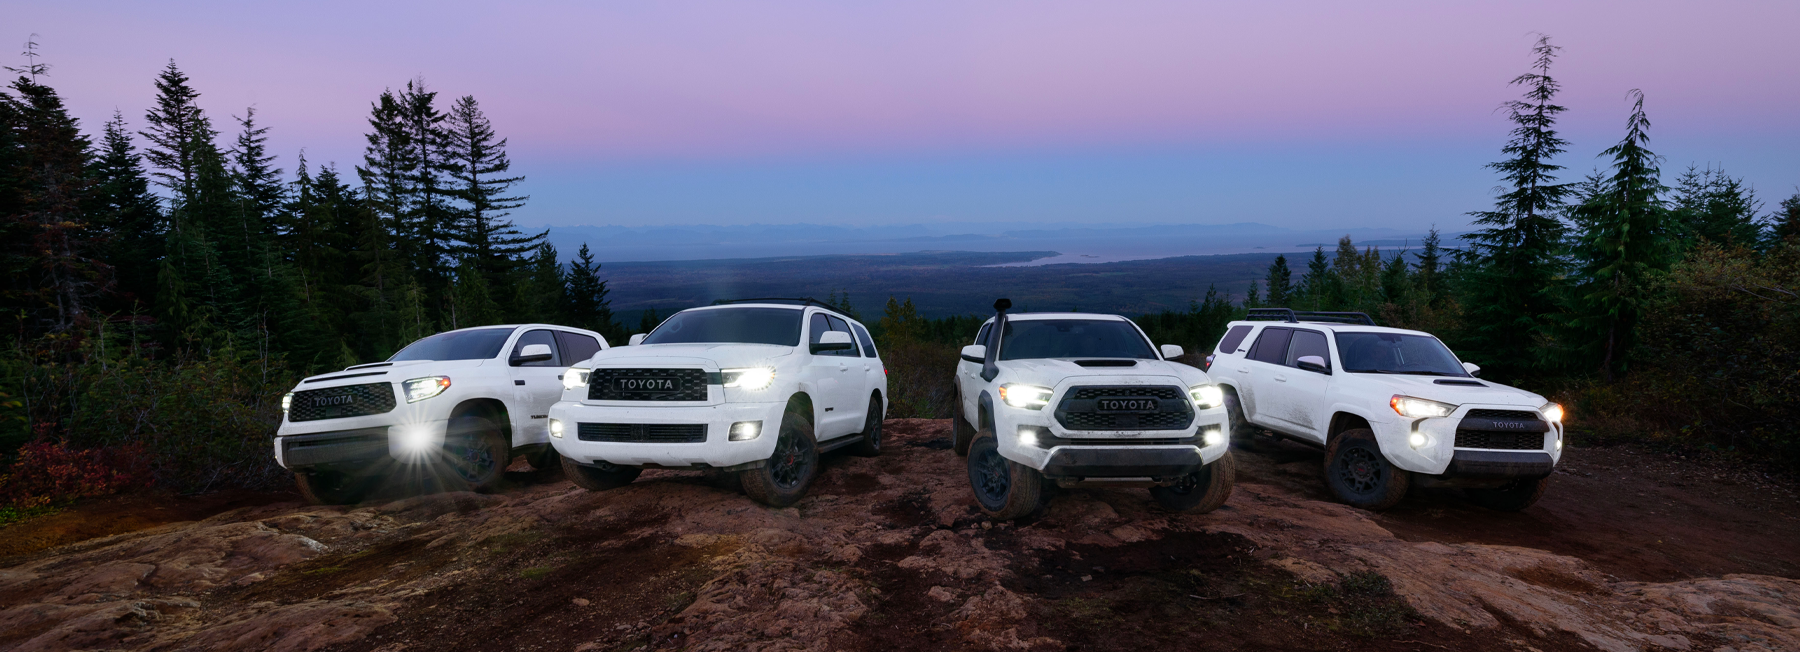 Bozeman Car Dealerships >> Toyota Of Bozeman New And Used Car Dealerships Bozeman Mt